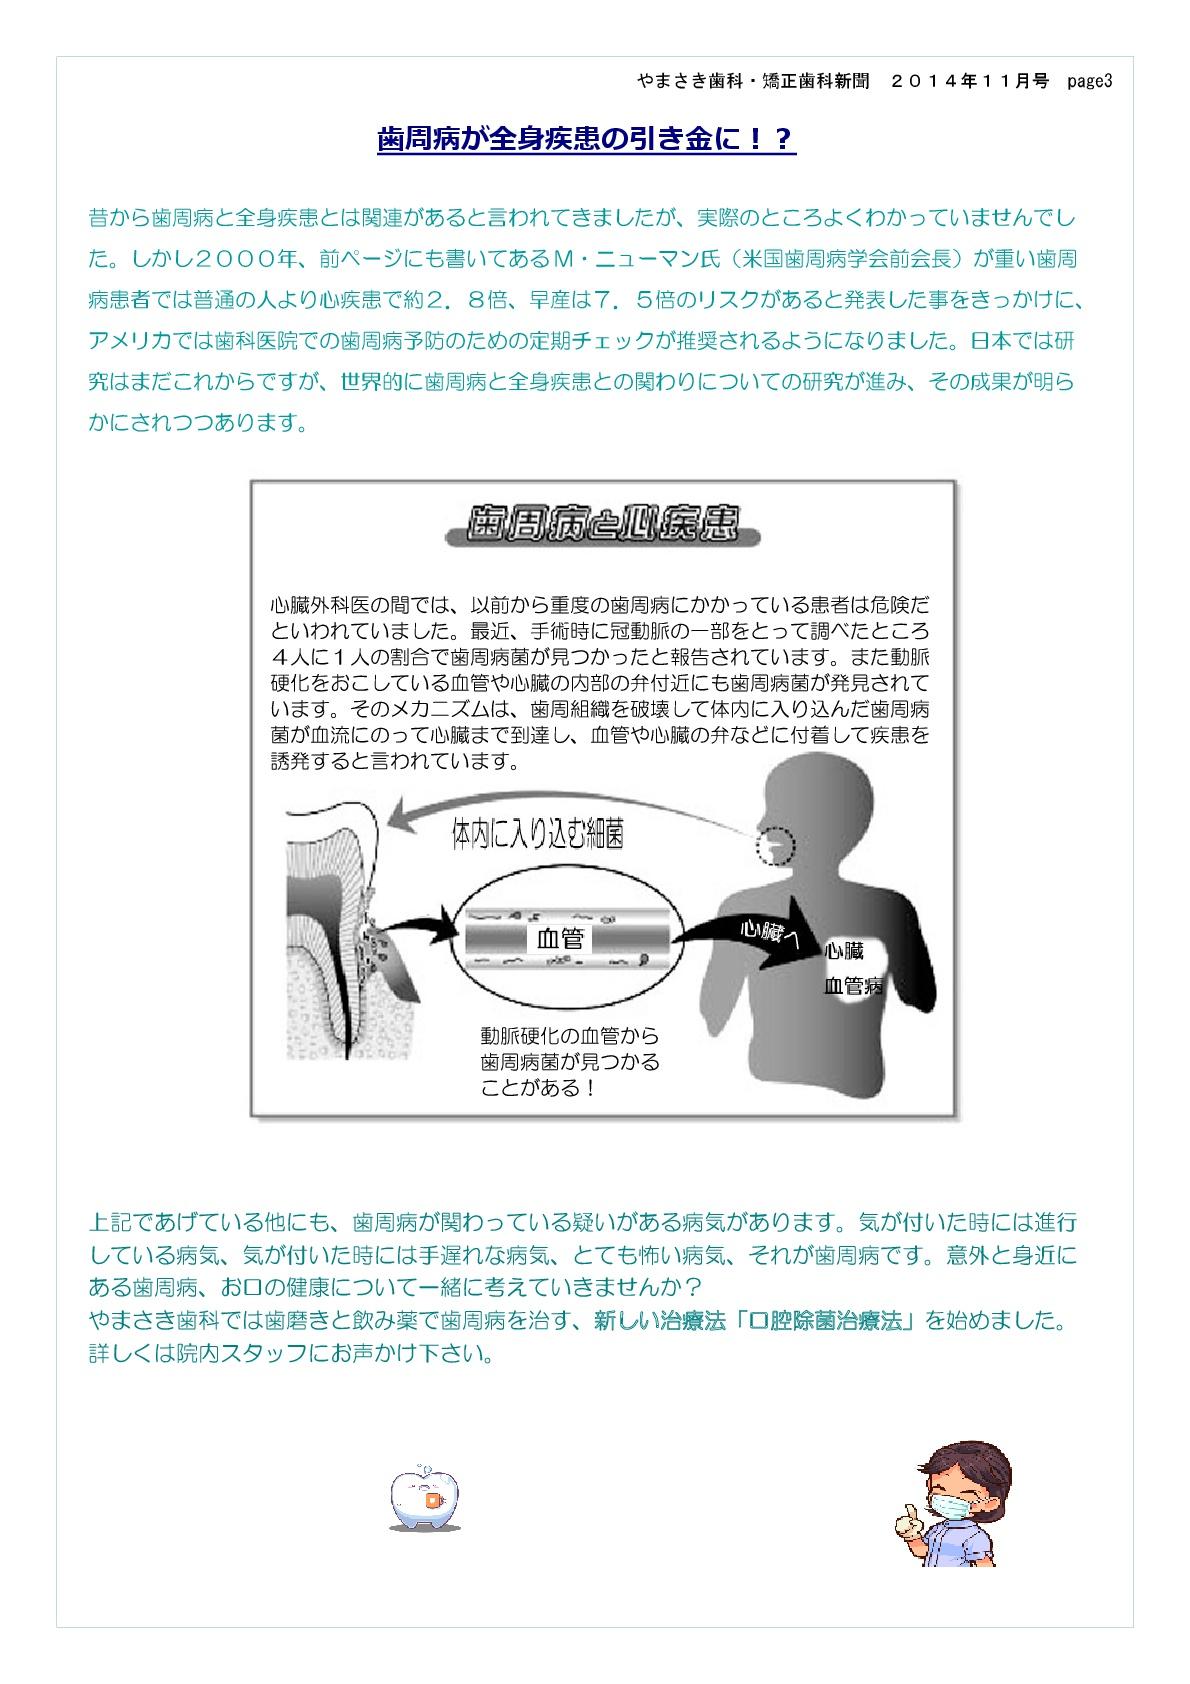 sinbun14-11-2-002